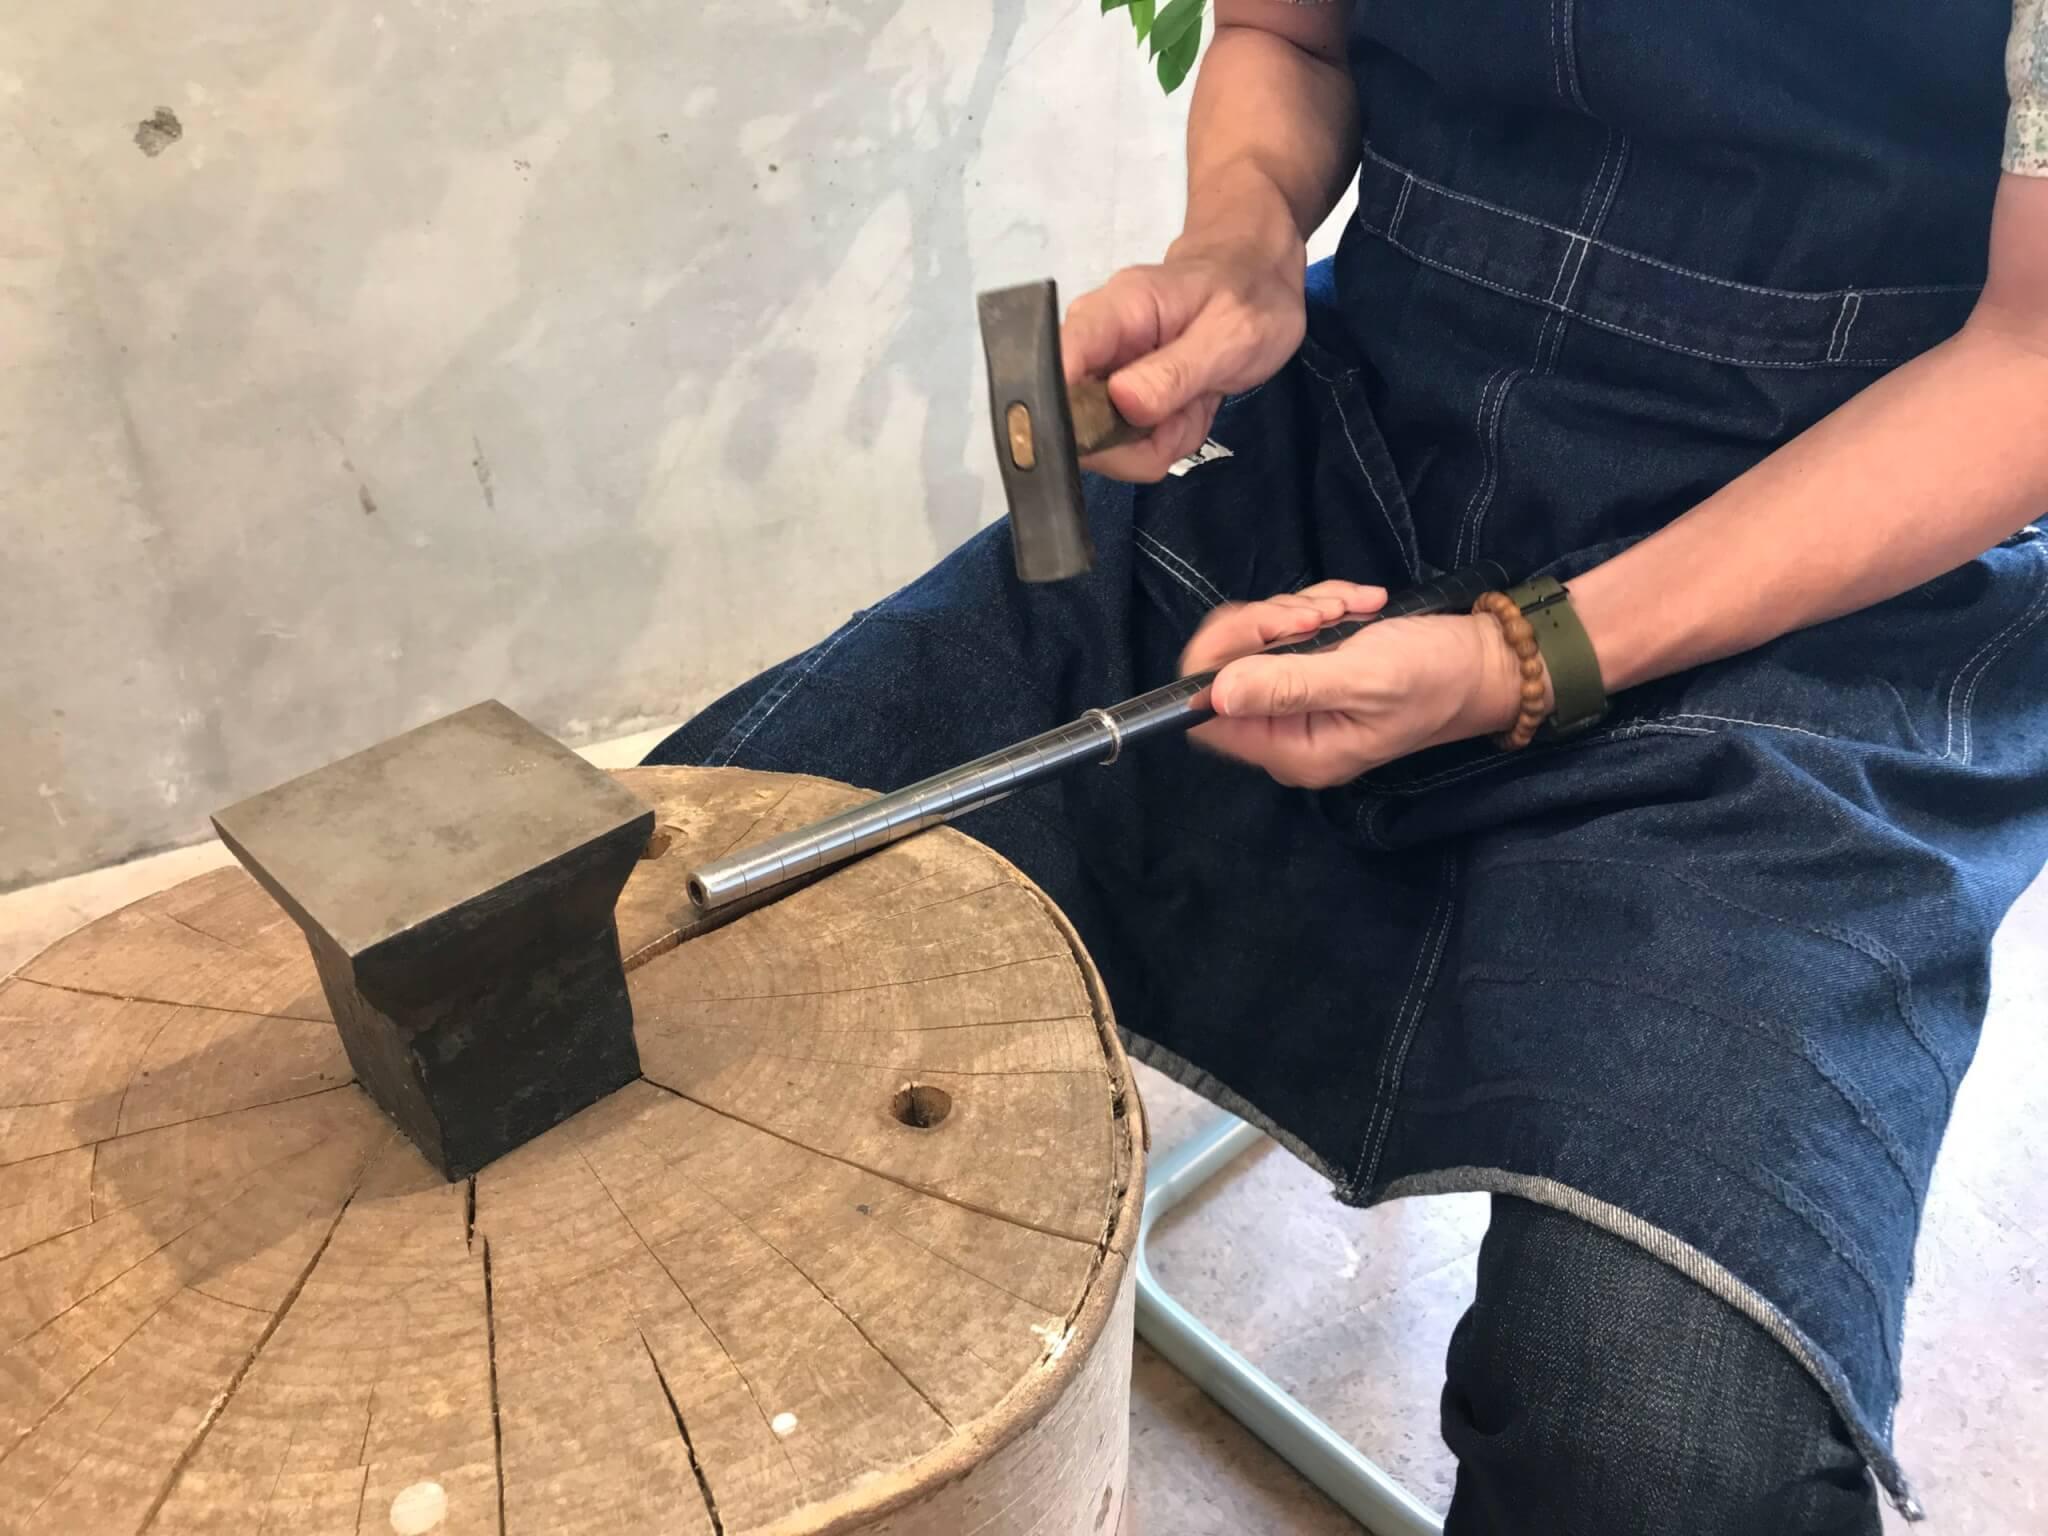 Workshop Tools: Kanadoko and Mokudai